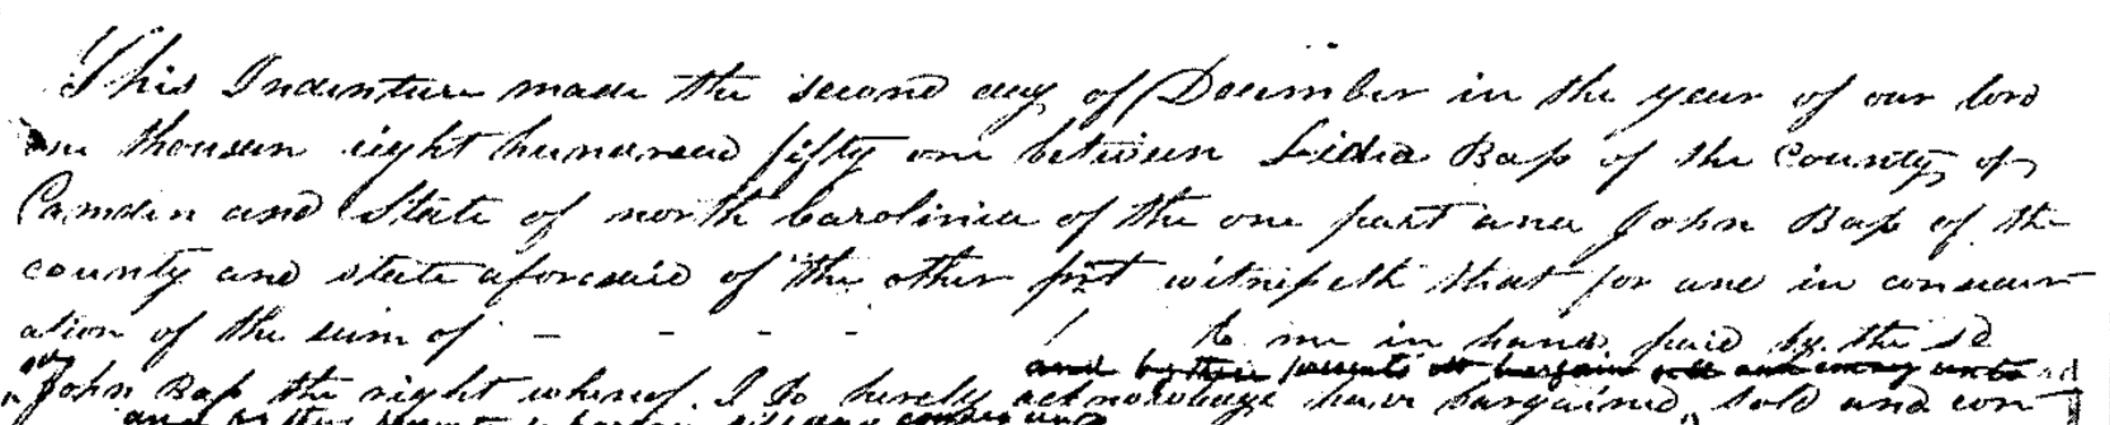 Lydia Bass John Bass 1851 Deed.png